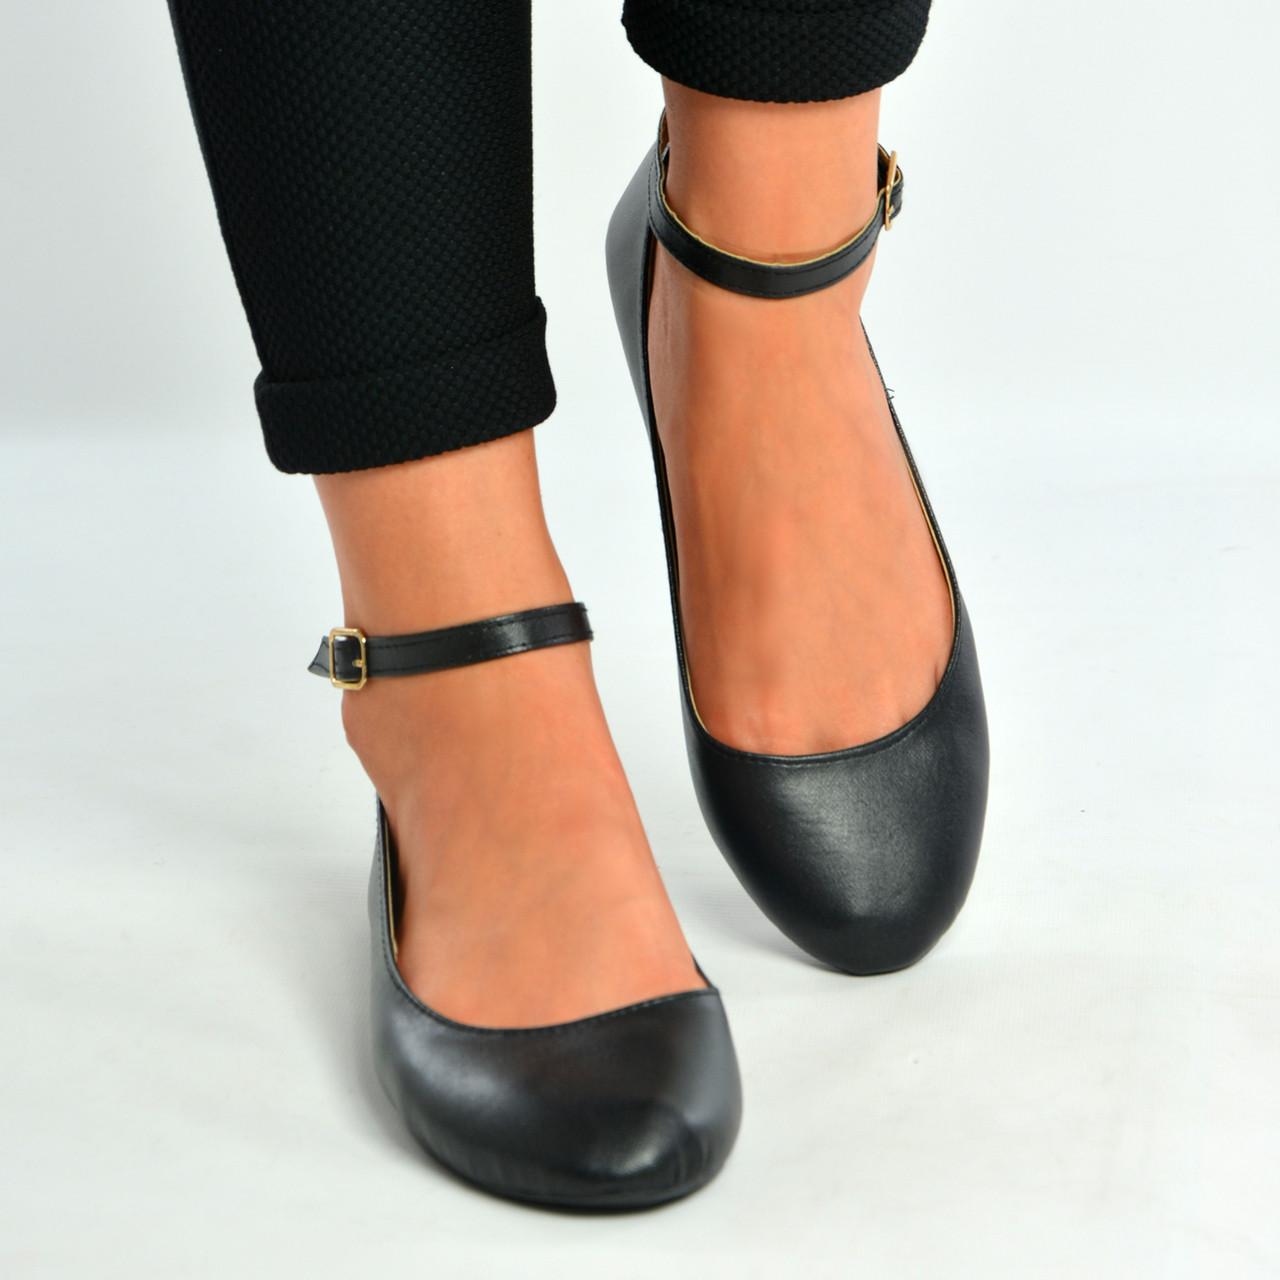 black ballet pumps with strap